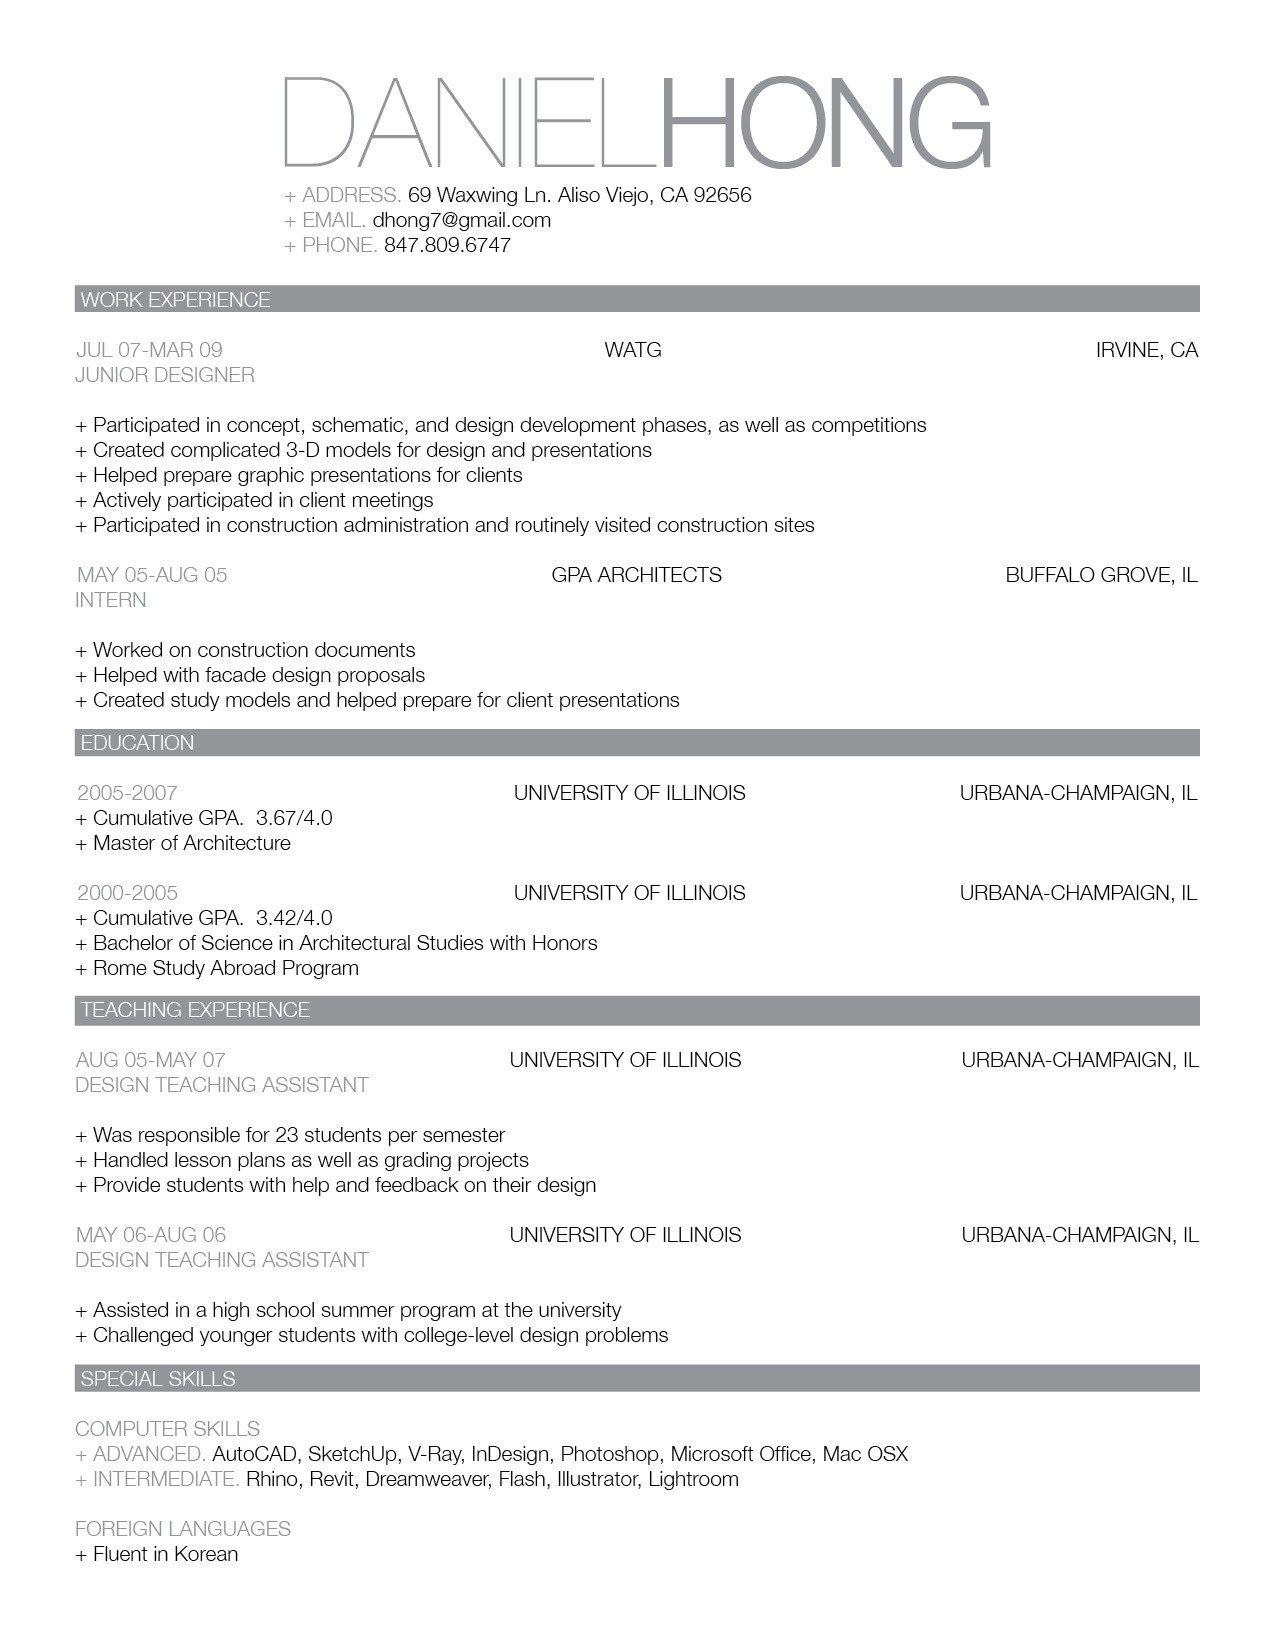 Cv Template Free Professional Resume Templates Word Good Cv Verbs Curriculum Vitae Europass Updated Cv And